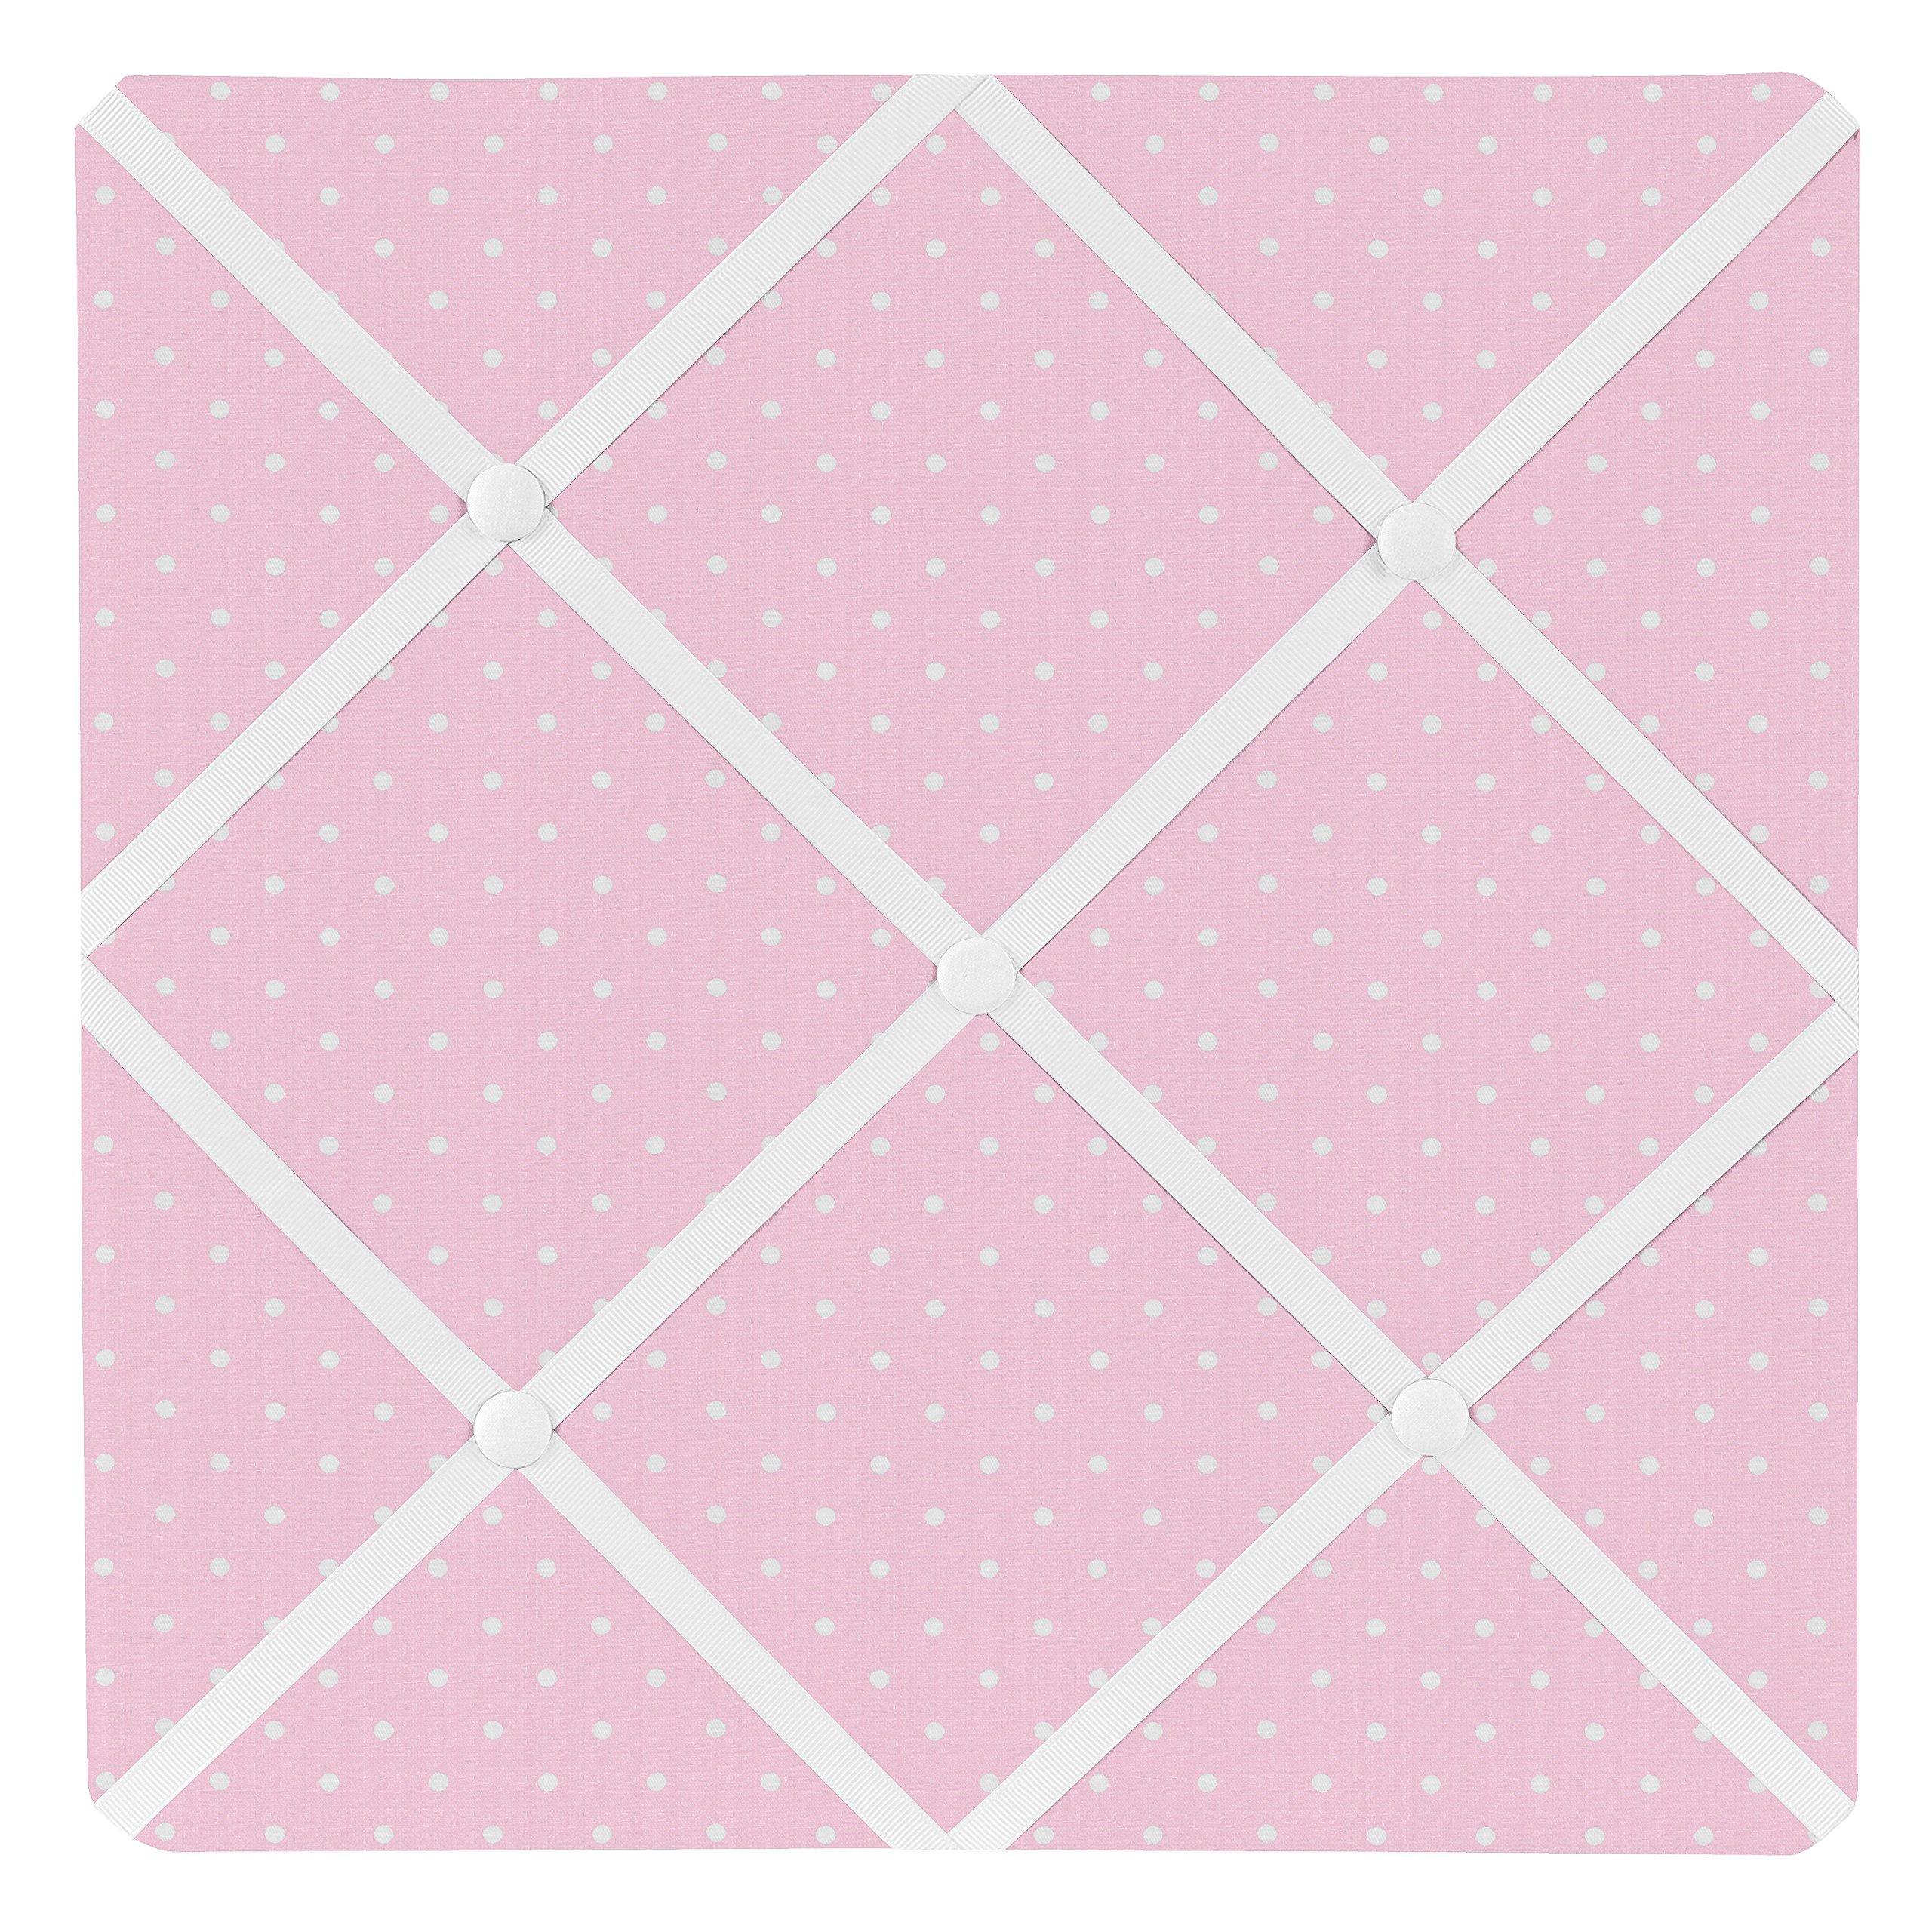 Pink Polka Dot Fabric Memory/Memo Photo Bulletin Board for Mod Dots Collection